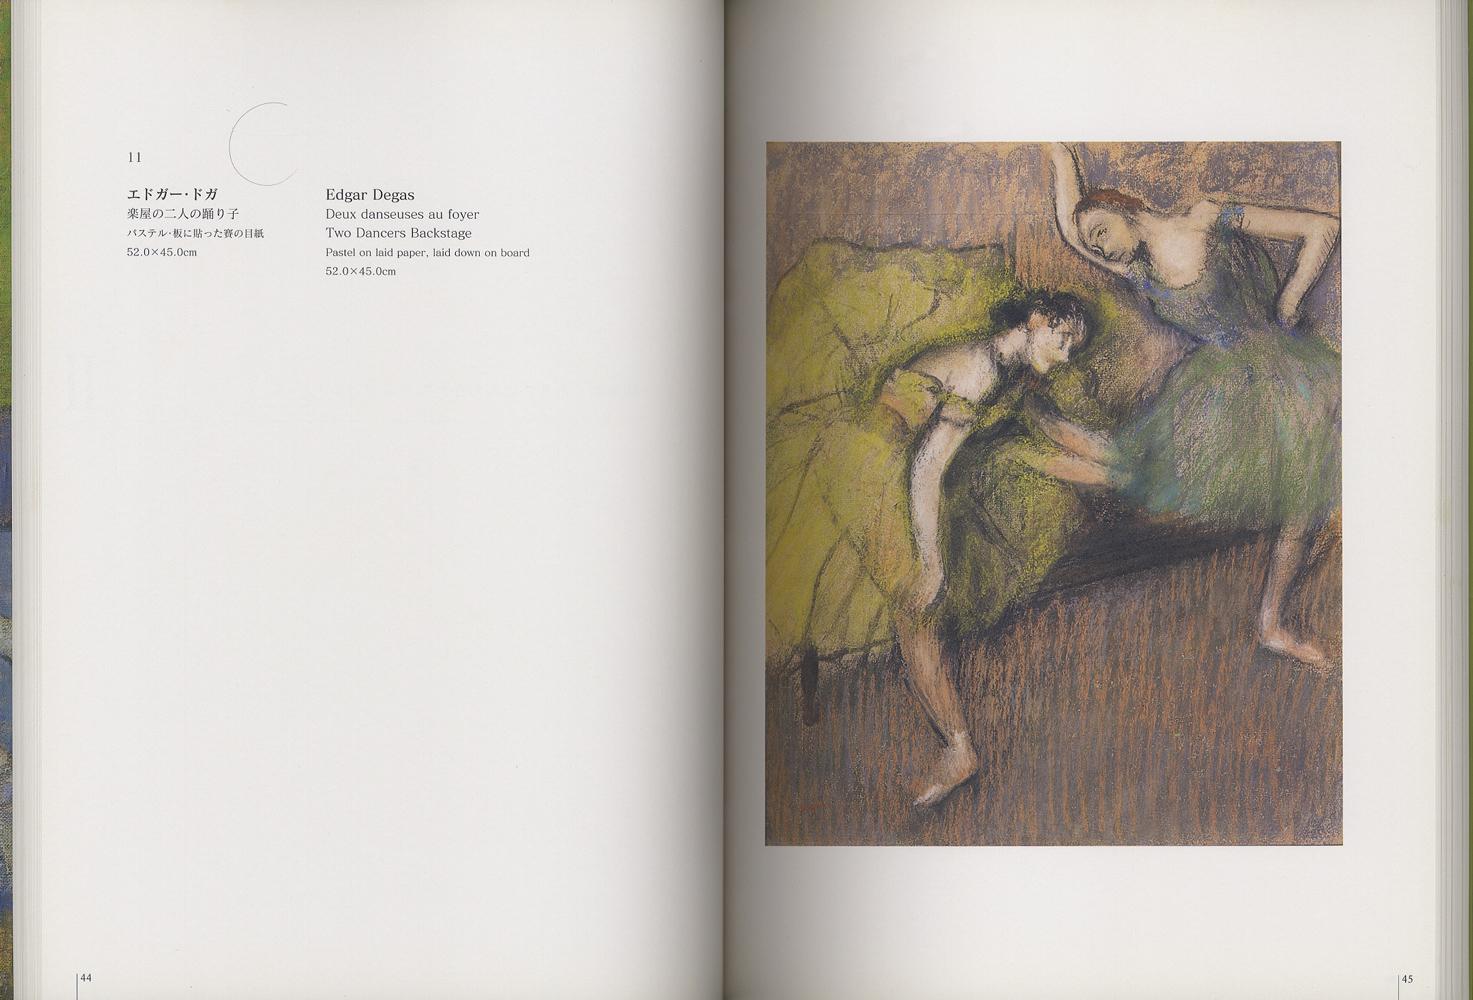 AIG コレクション フランス印象派からエコール・ド・パリへ[image2]